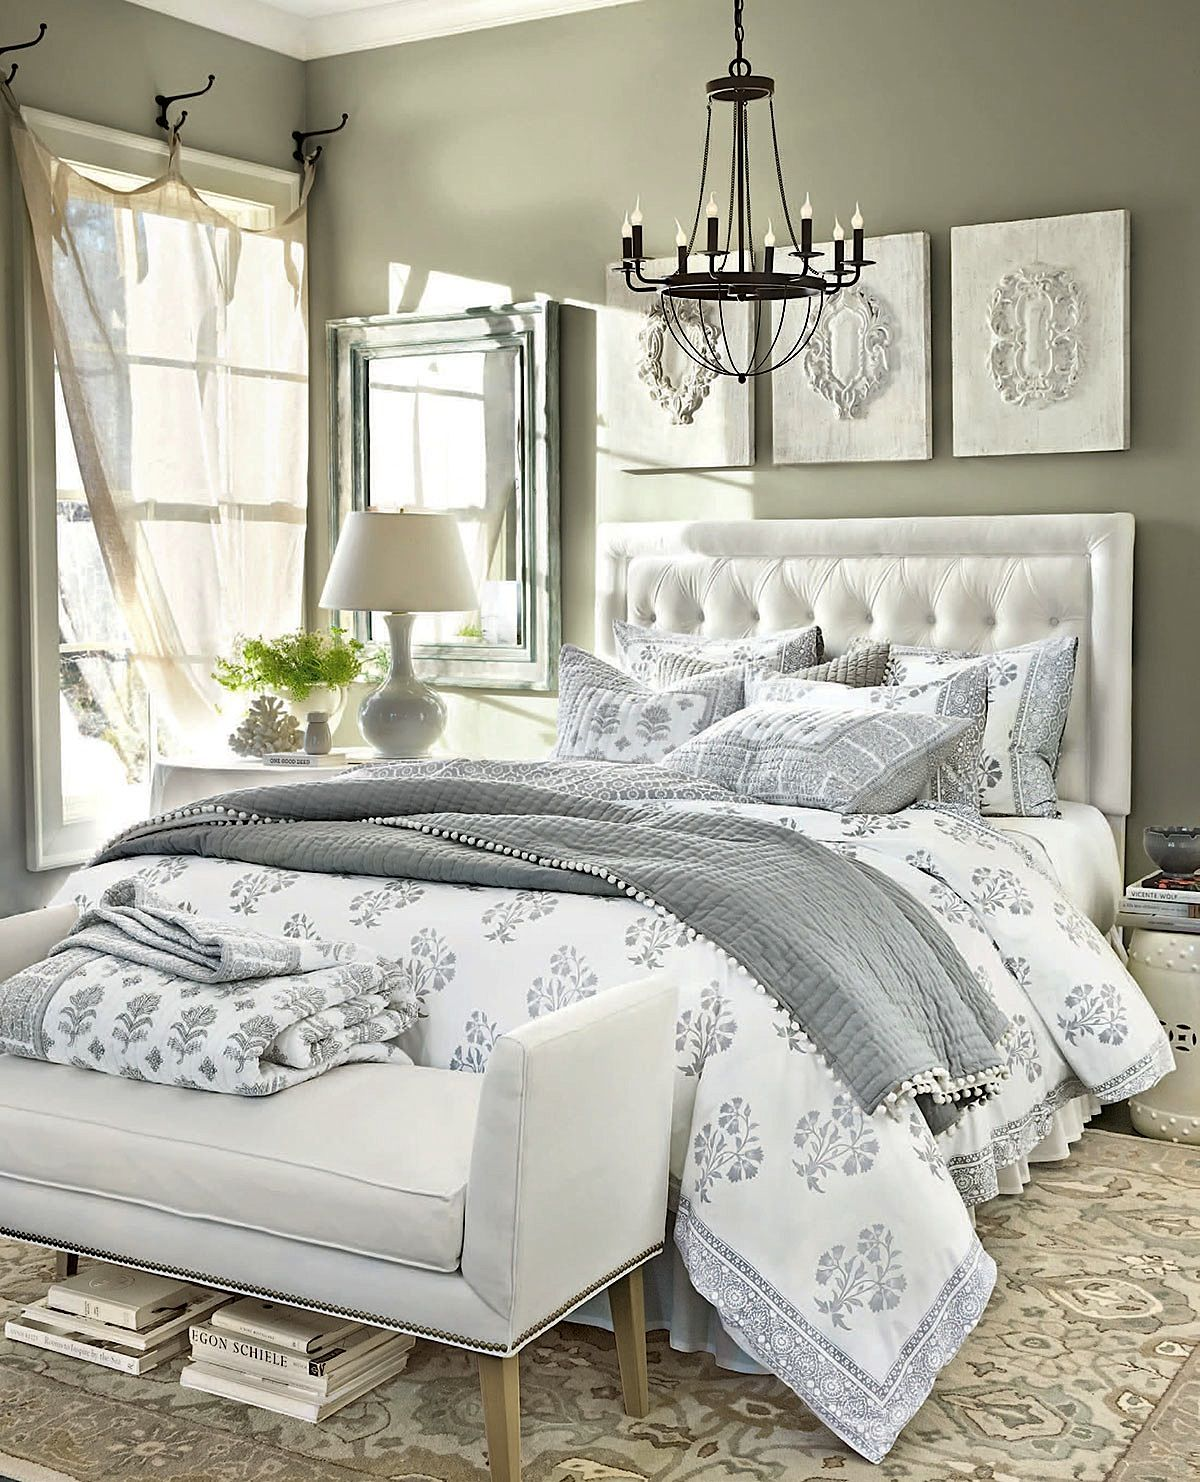 Bedroom Decorating Ideas White Bedroom Decor Home Bedroom